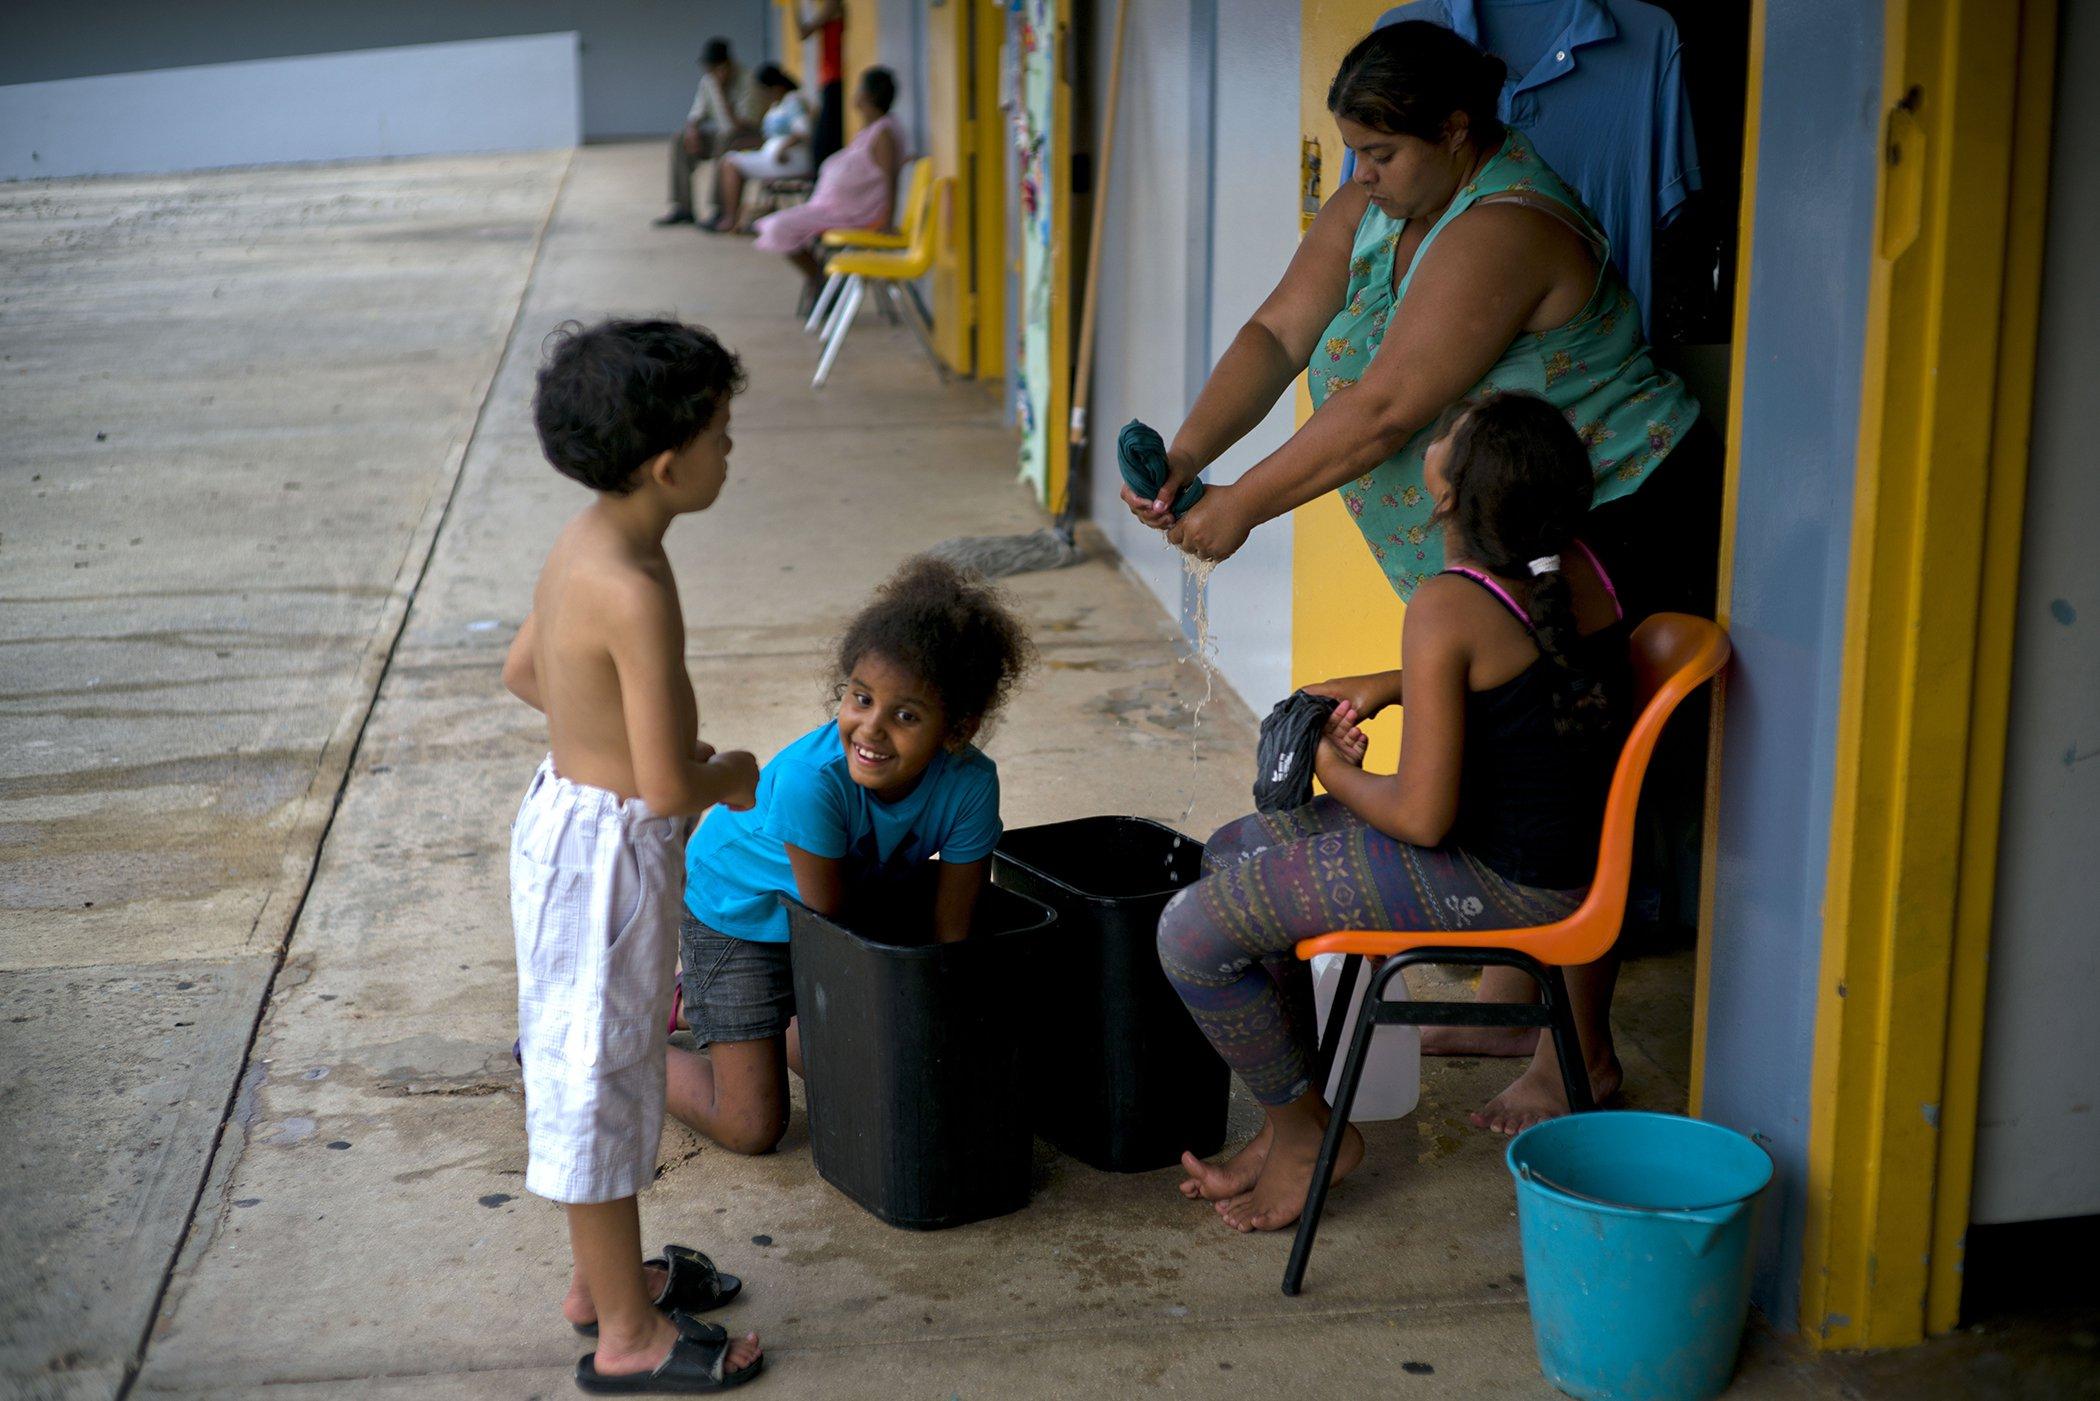 Women-Climate-Change-Hurricane-Maria-004.jpg